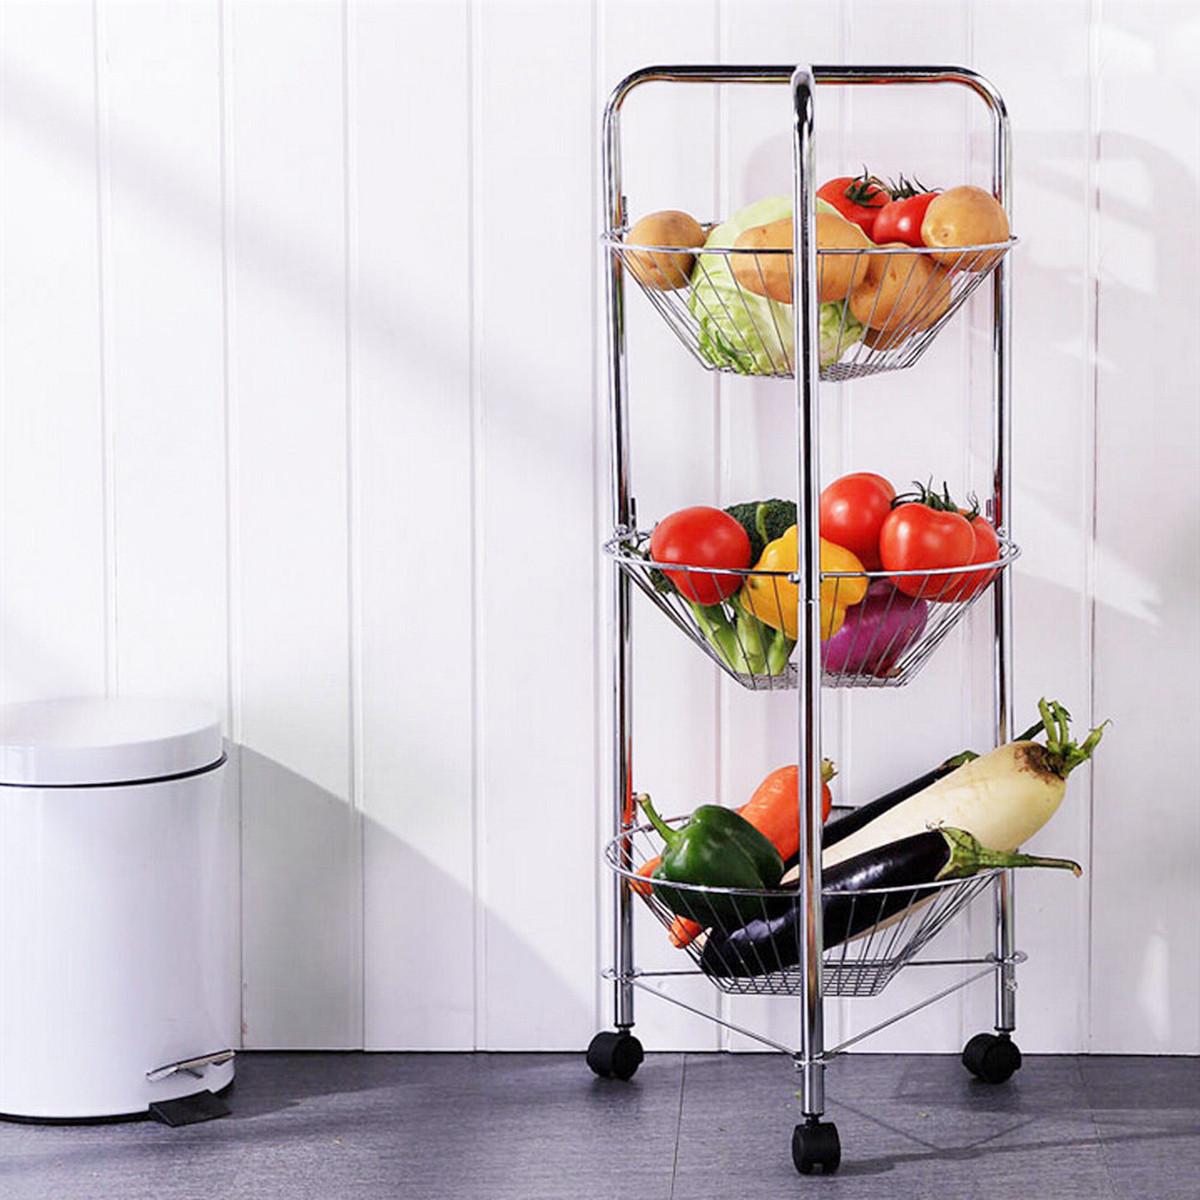 3 Tier Basket Rack Stand Fruit Vegetable Metal Storage Holder Kitchen Display Lazada Singapore